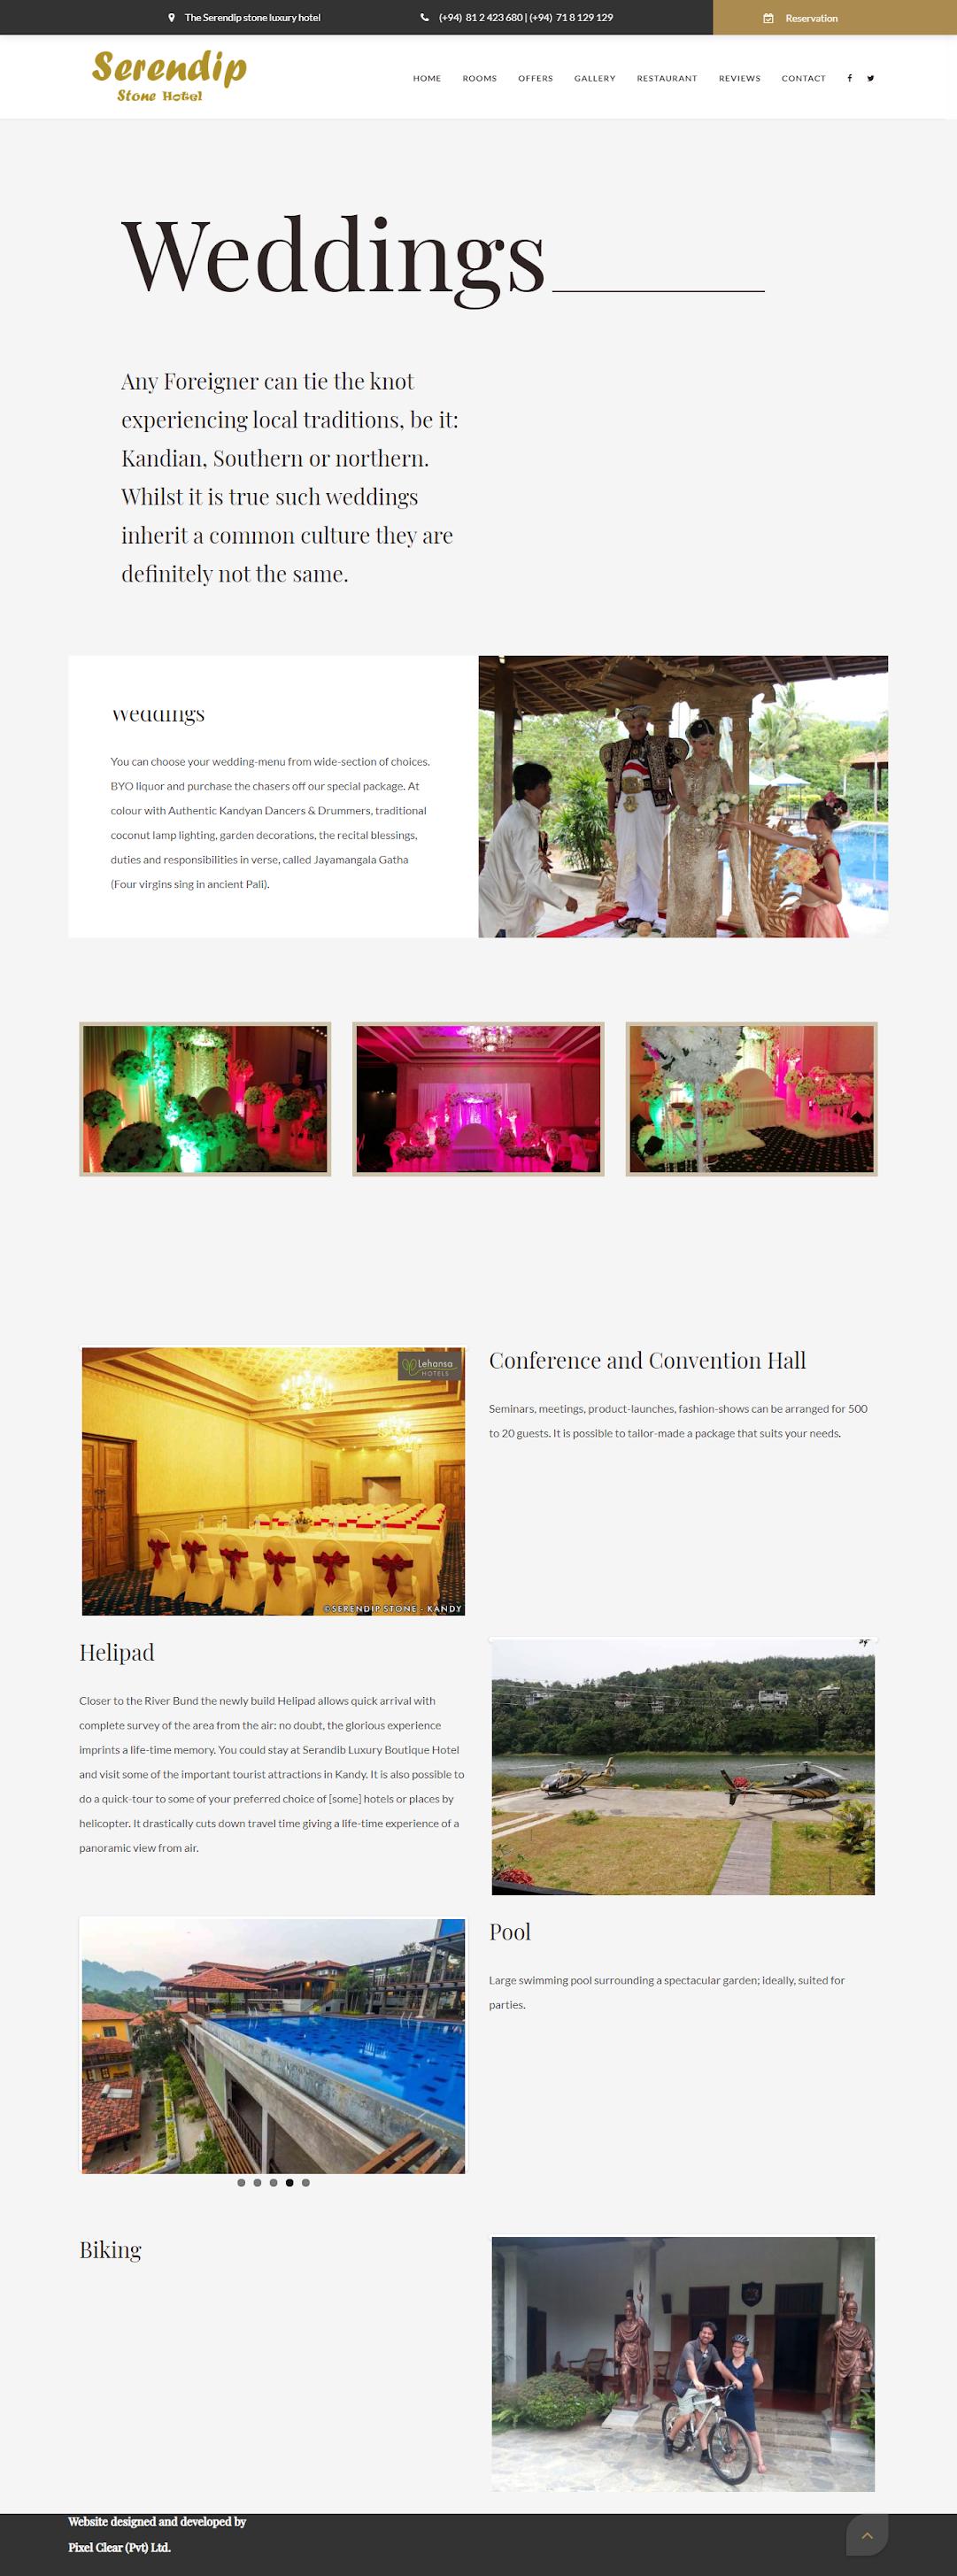 screencapture-serandip-lk-activities-2018-12-07-12_31_18